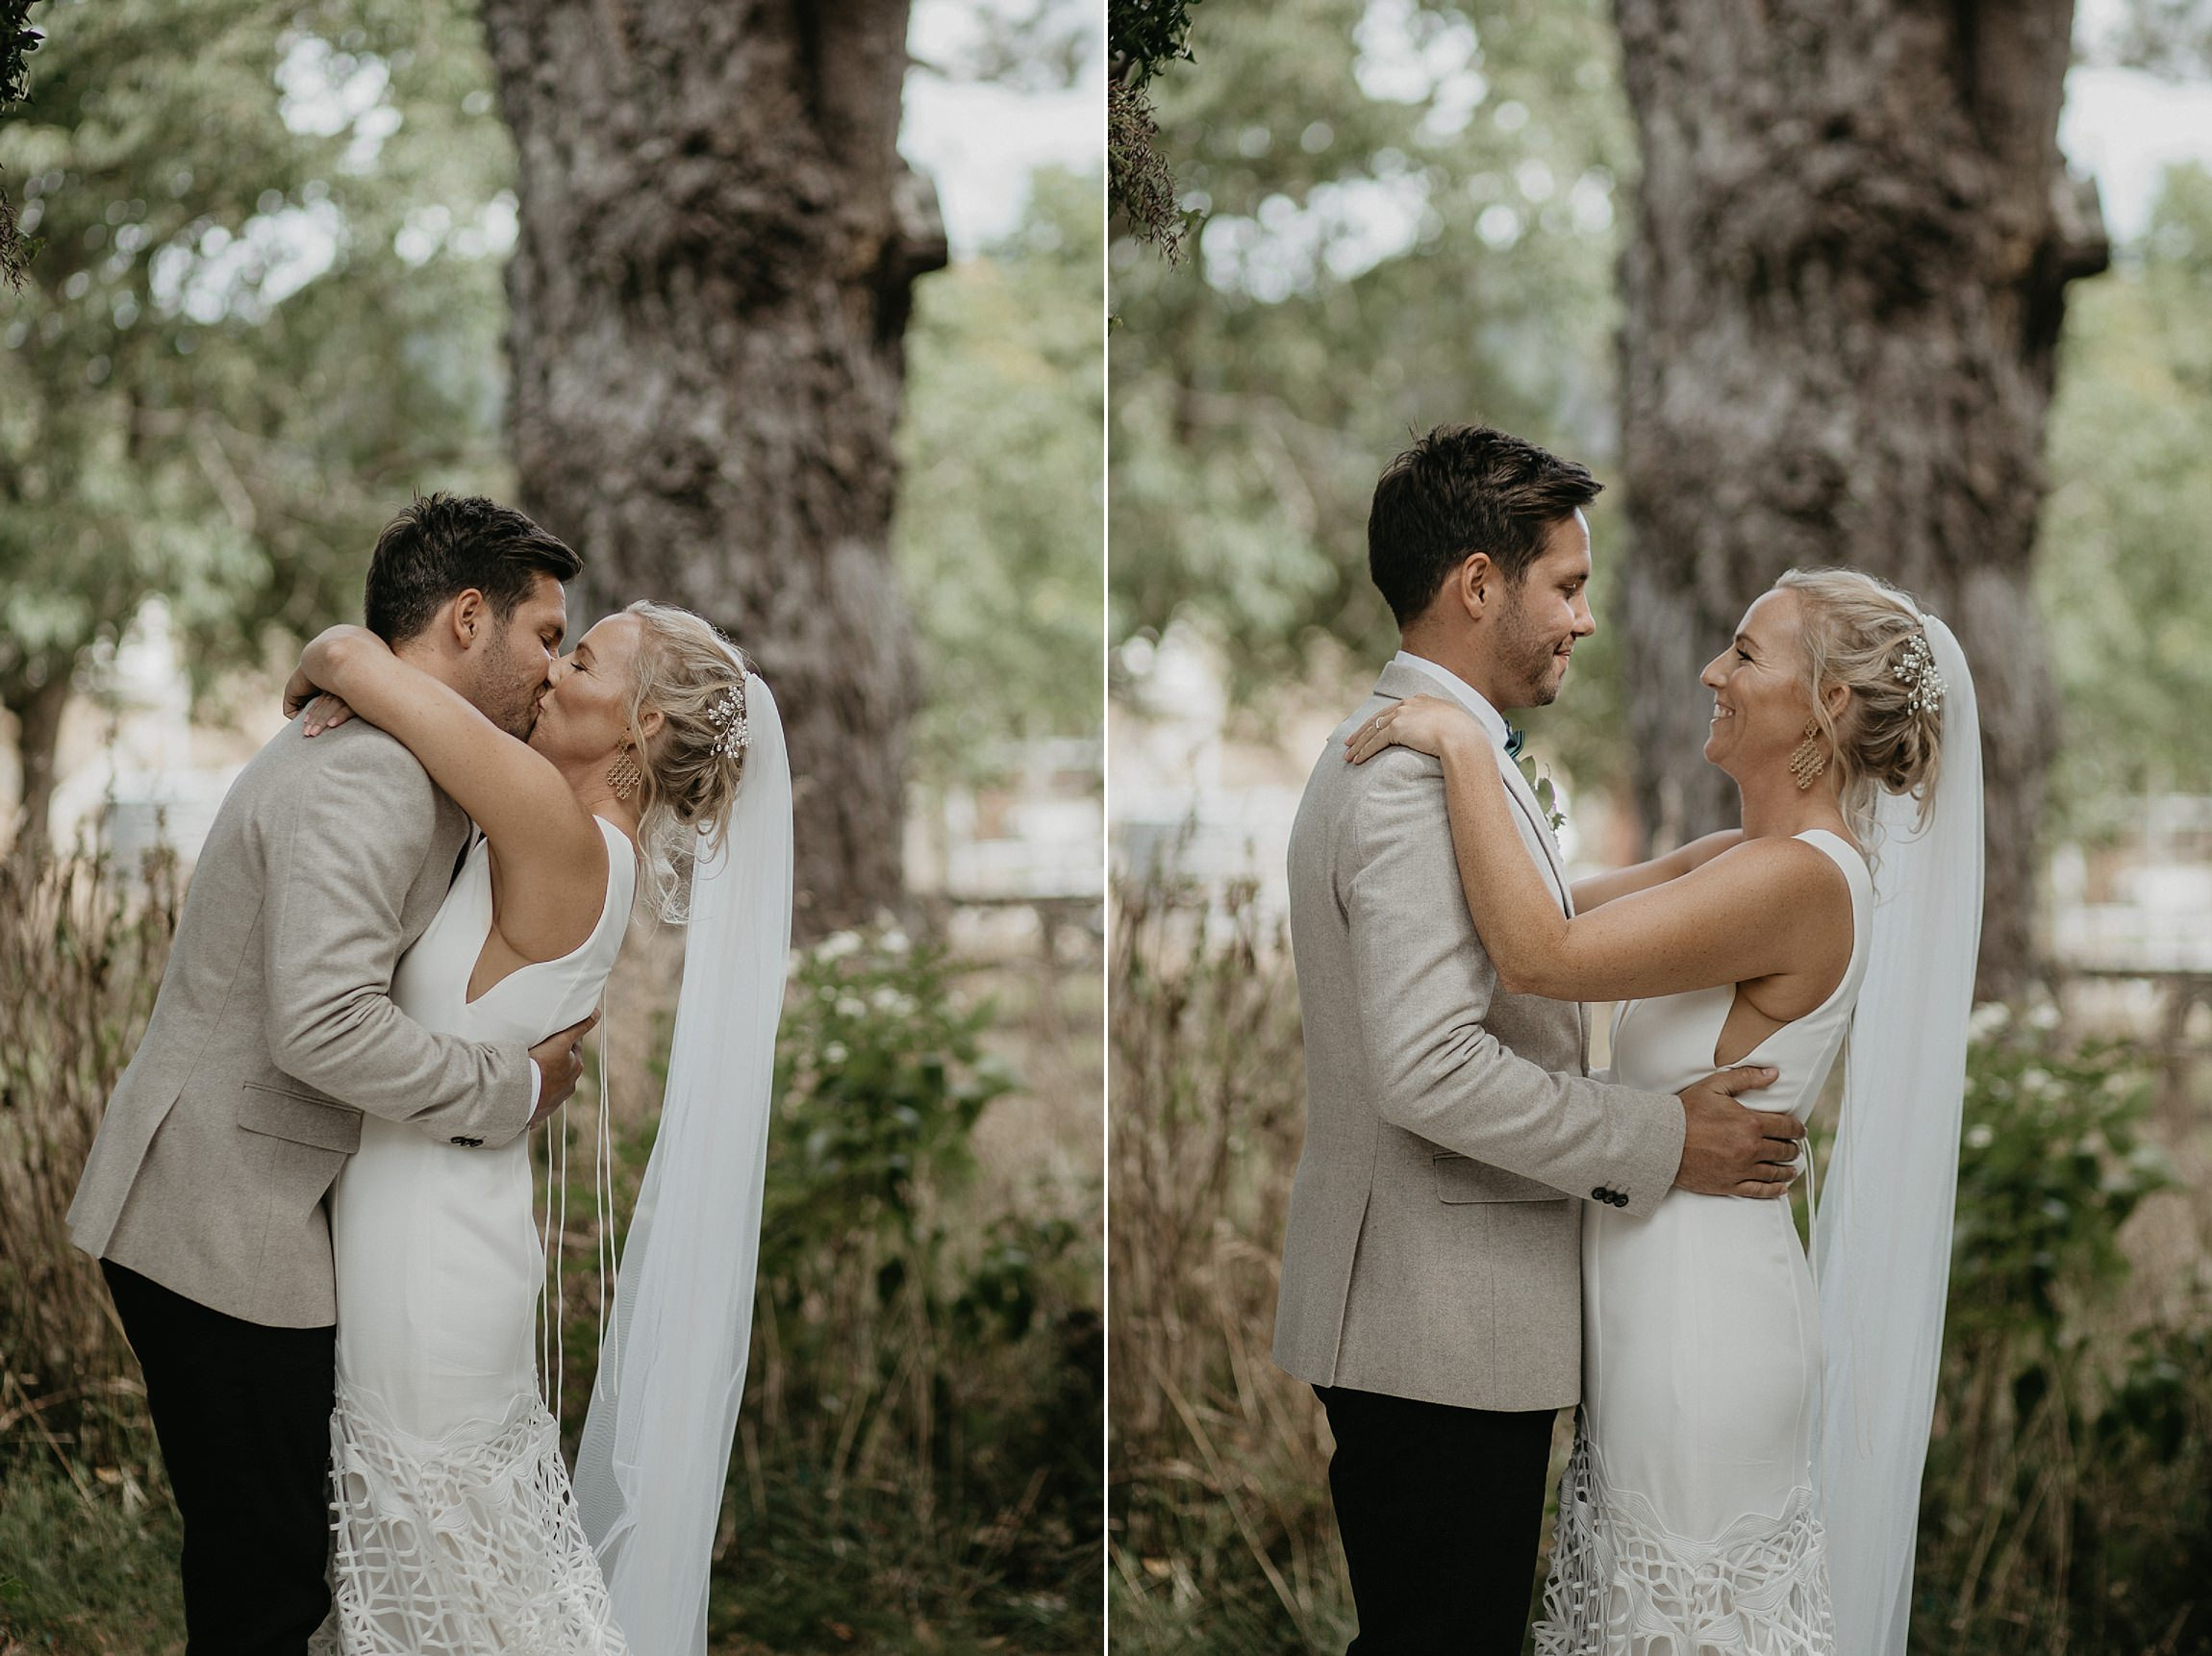 oldforestschool-wedding-blog-109.jpg